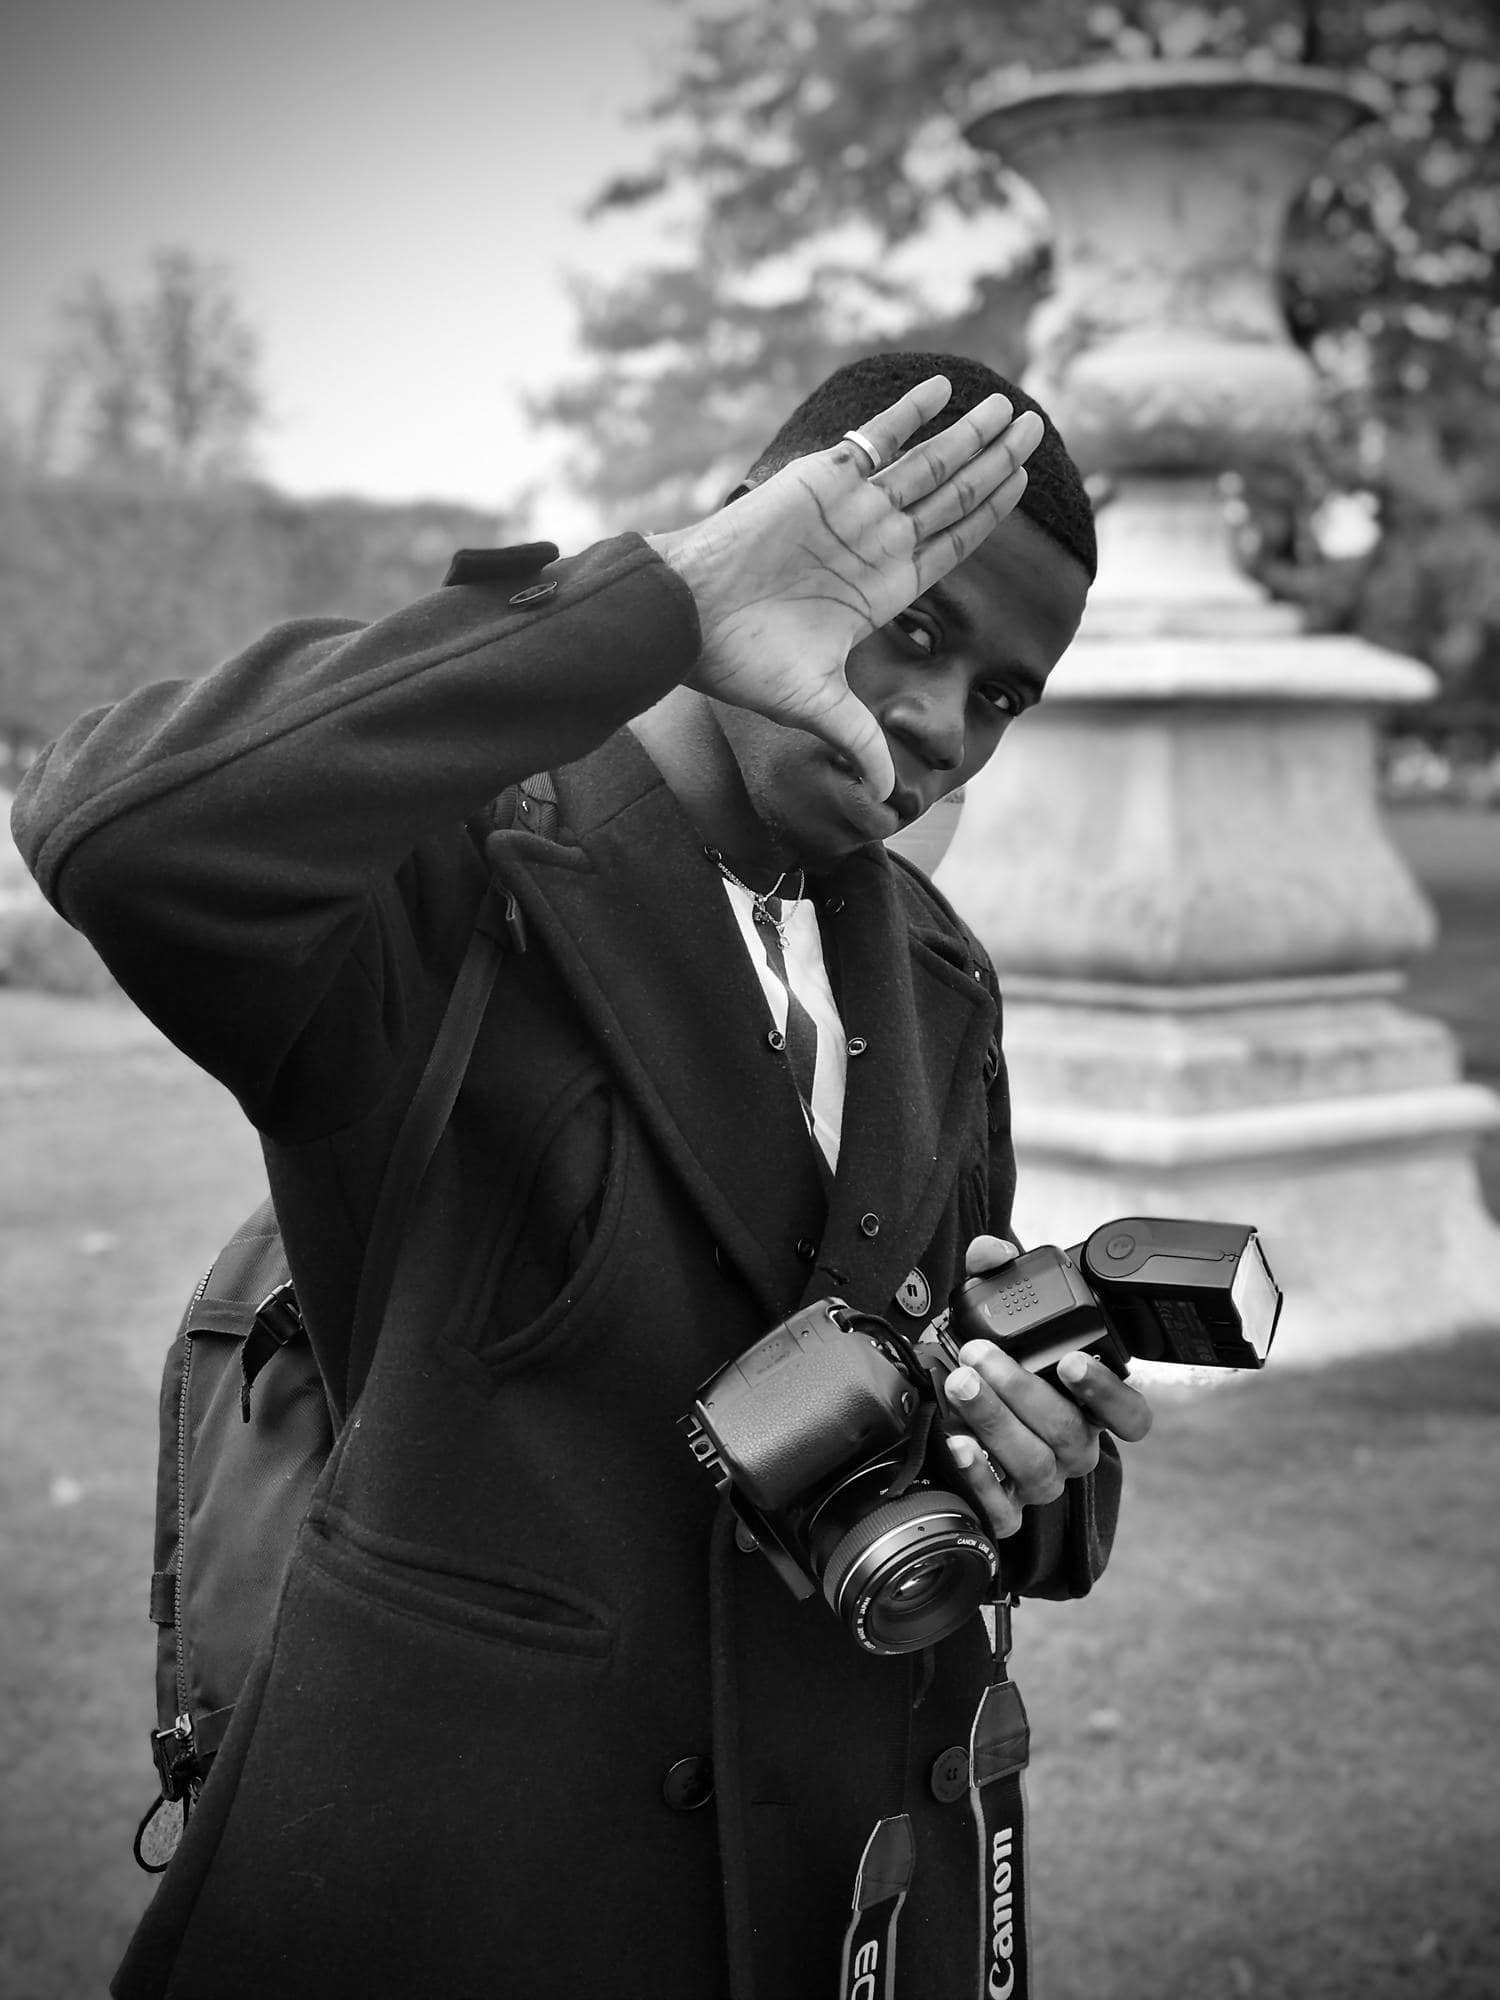 Fotógrafo con flash en la mano